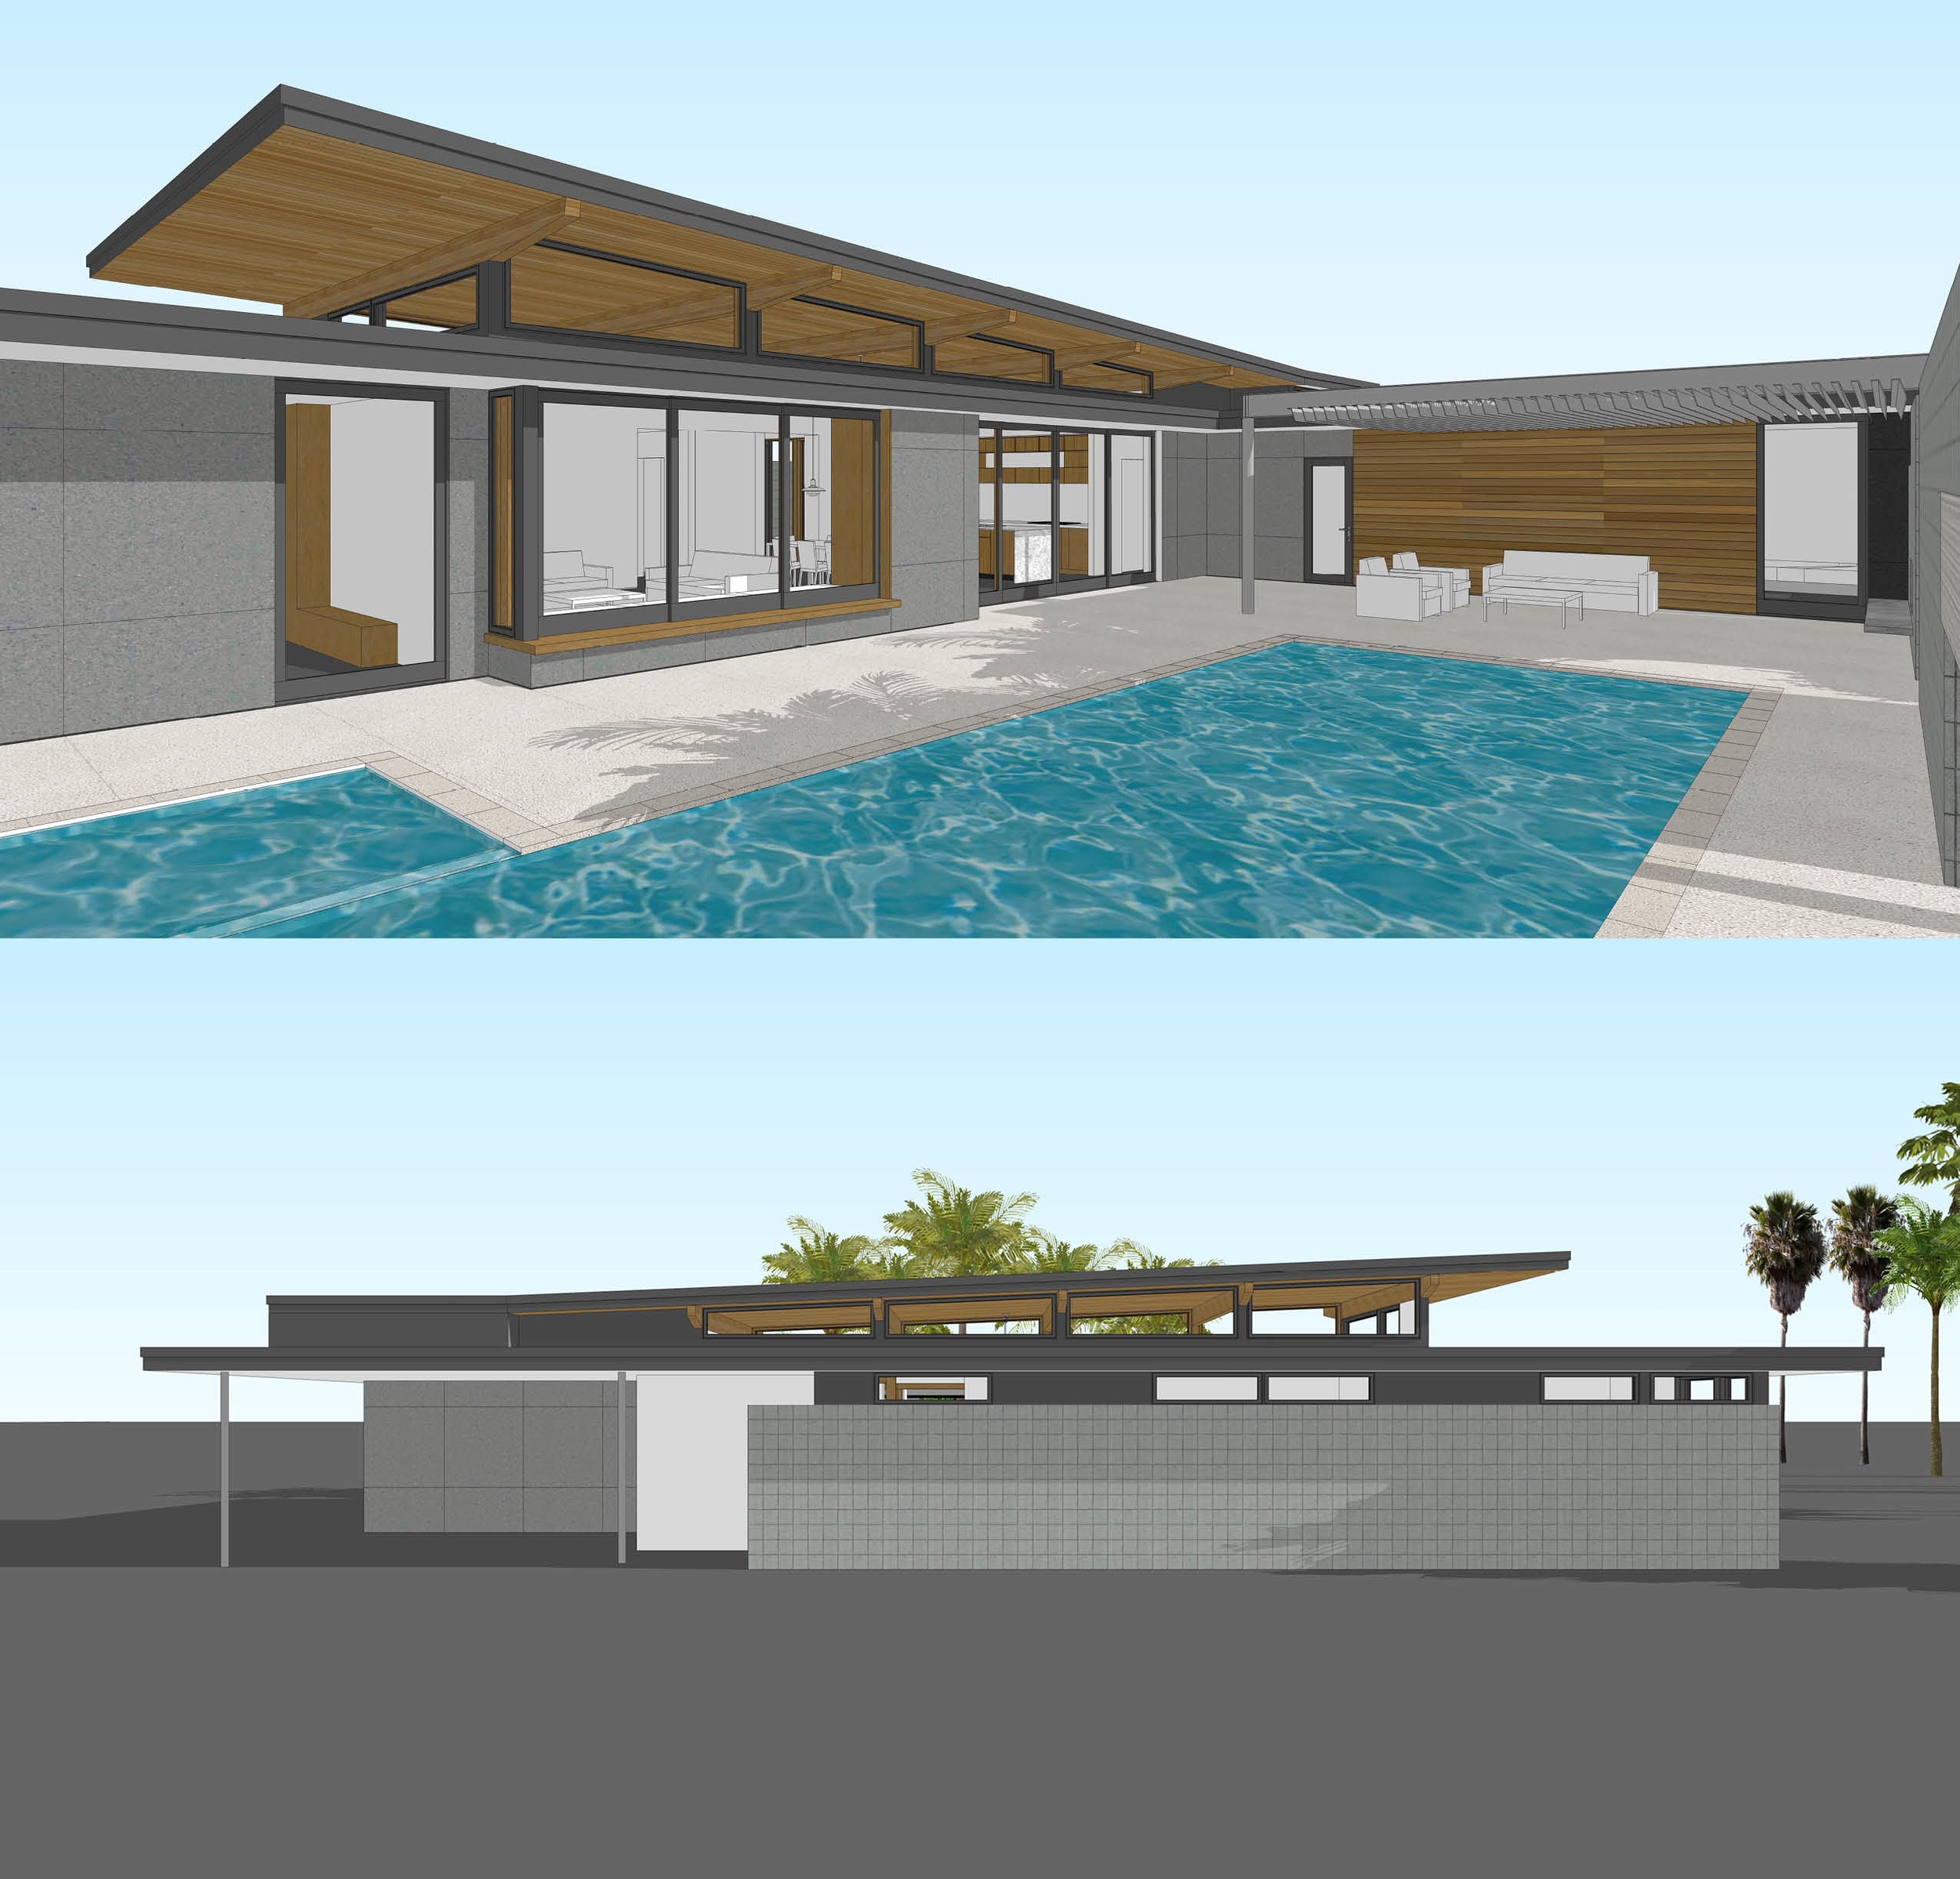 turkel_design_modern_prefab_home_axiomdeserthouse_cladding_study_optionB.JPG